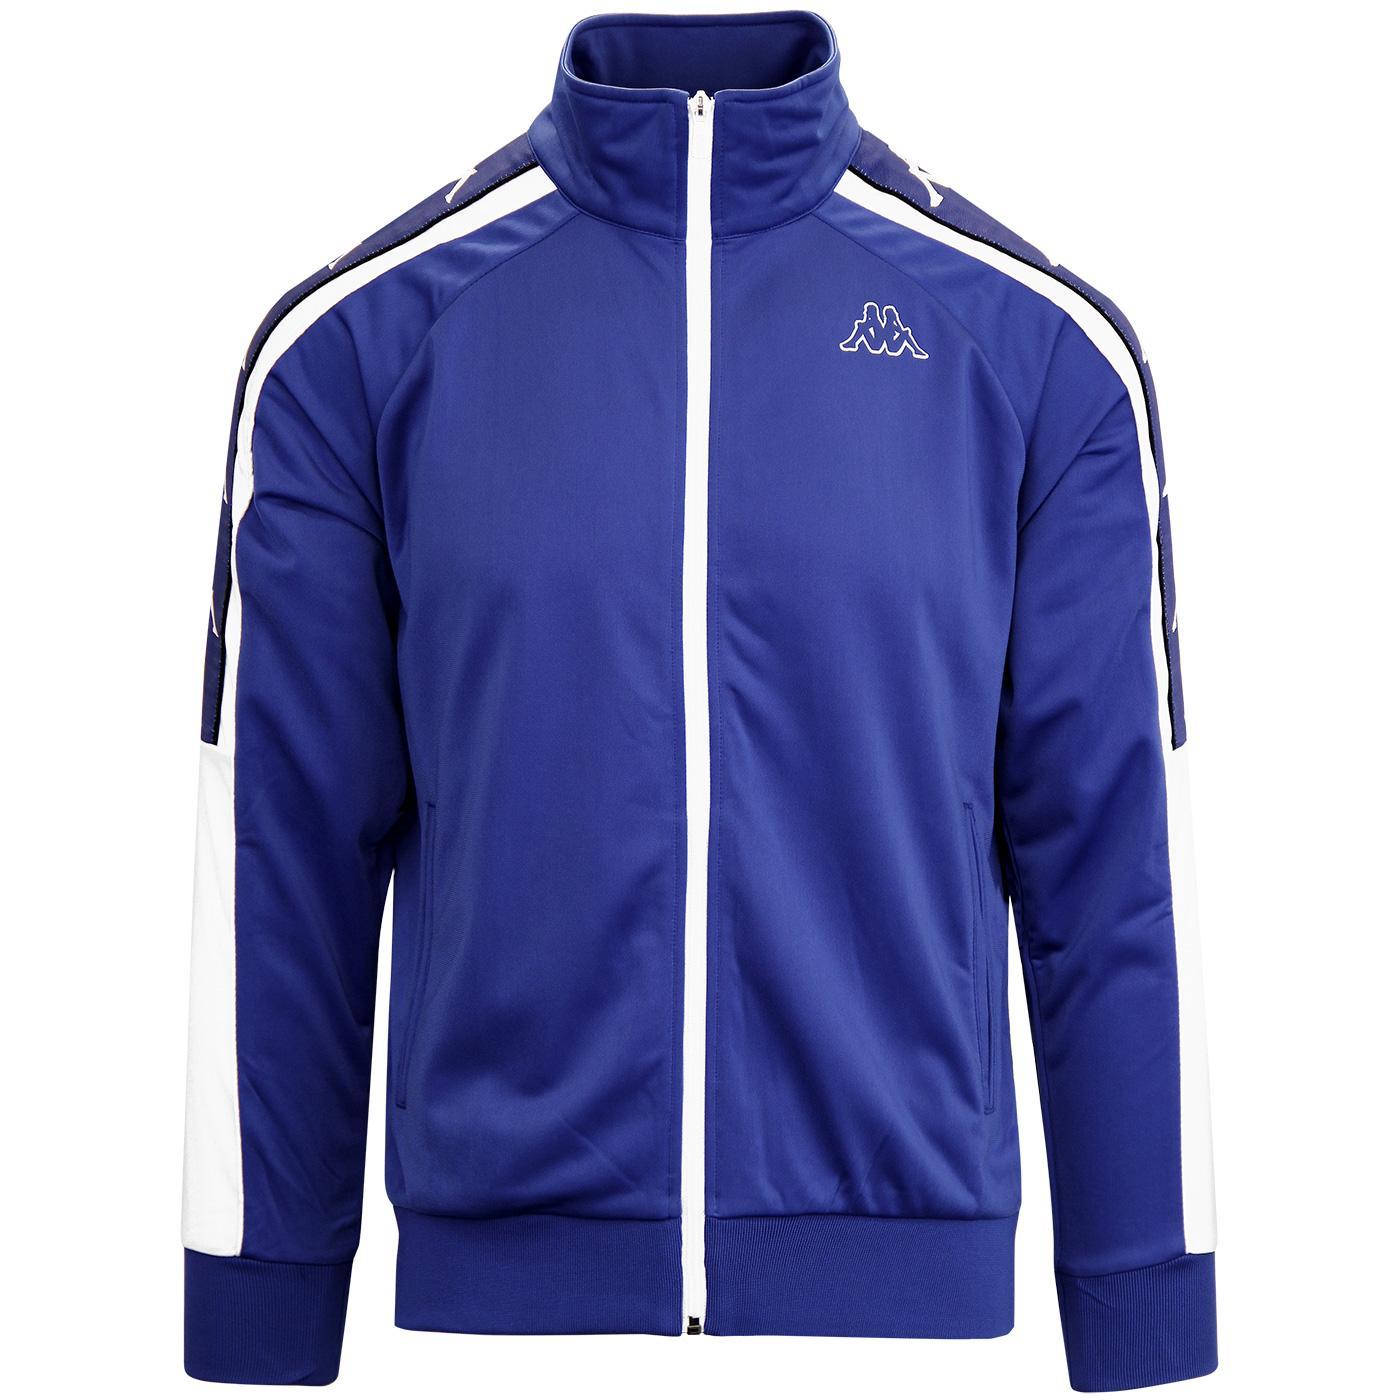 Banda Ahran KAPPA Retro Track Jacket (Blue/White)